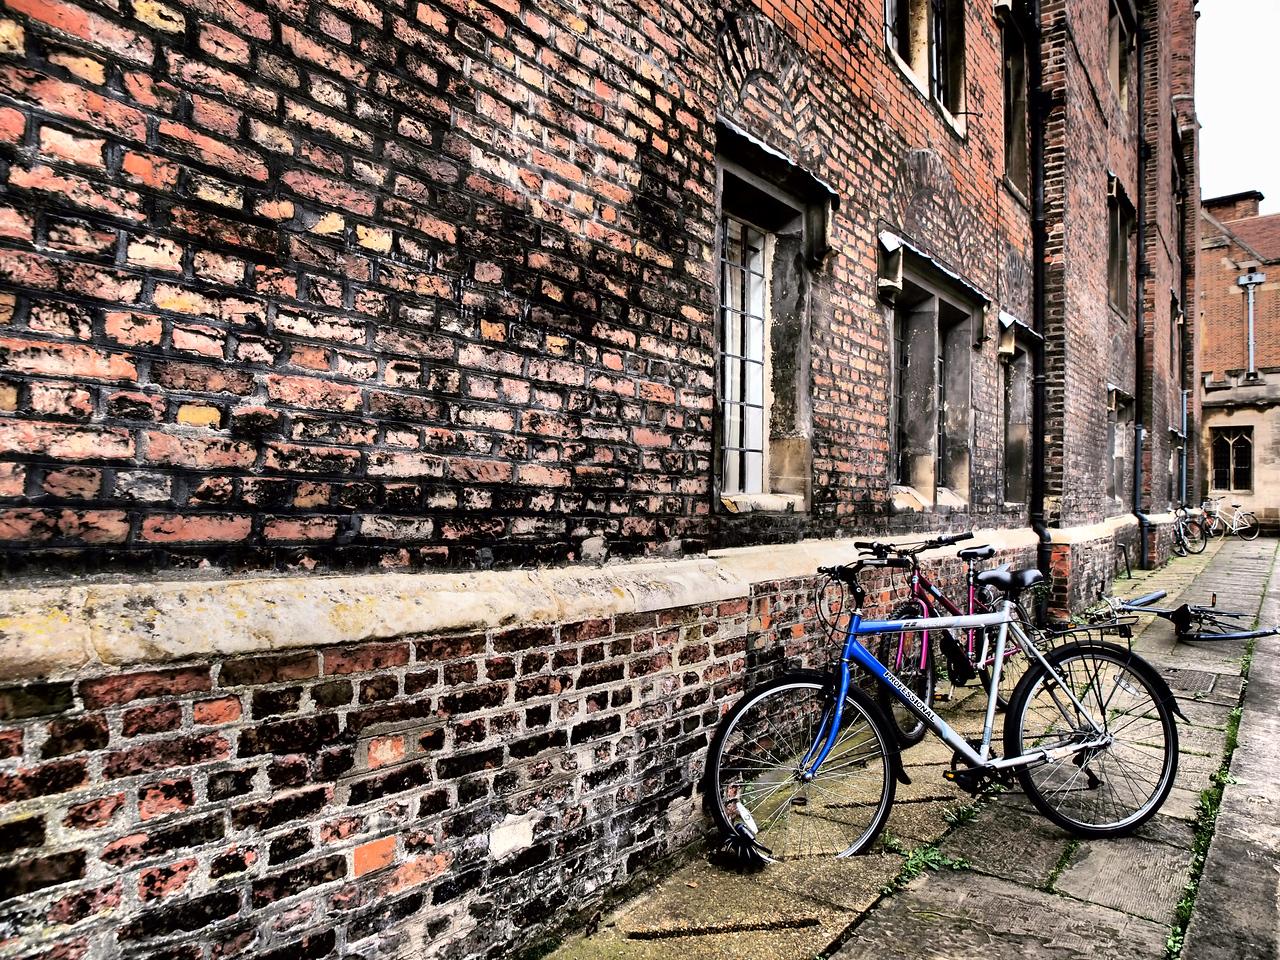 A bike parked on a side street in Cambridge.